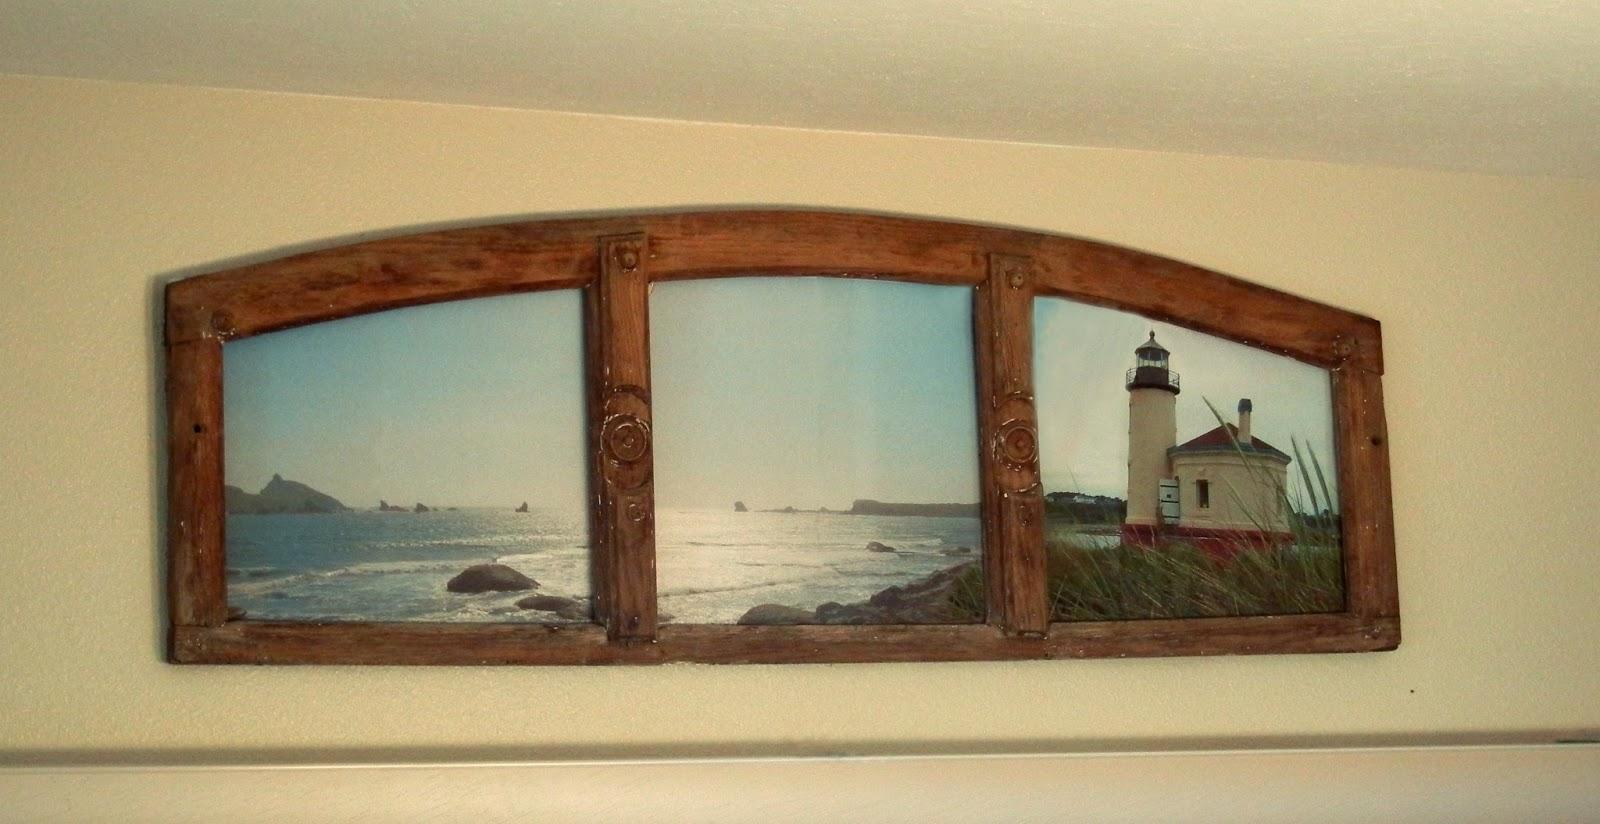 Window frames ideas for window frames for New window frame designs